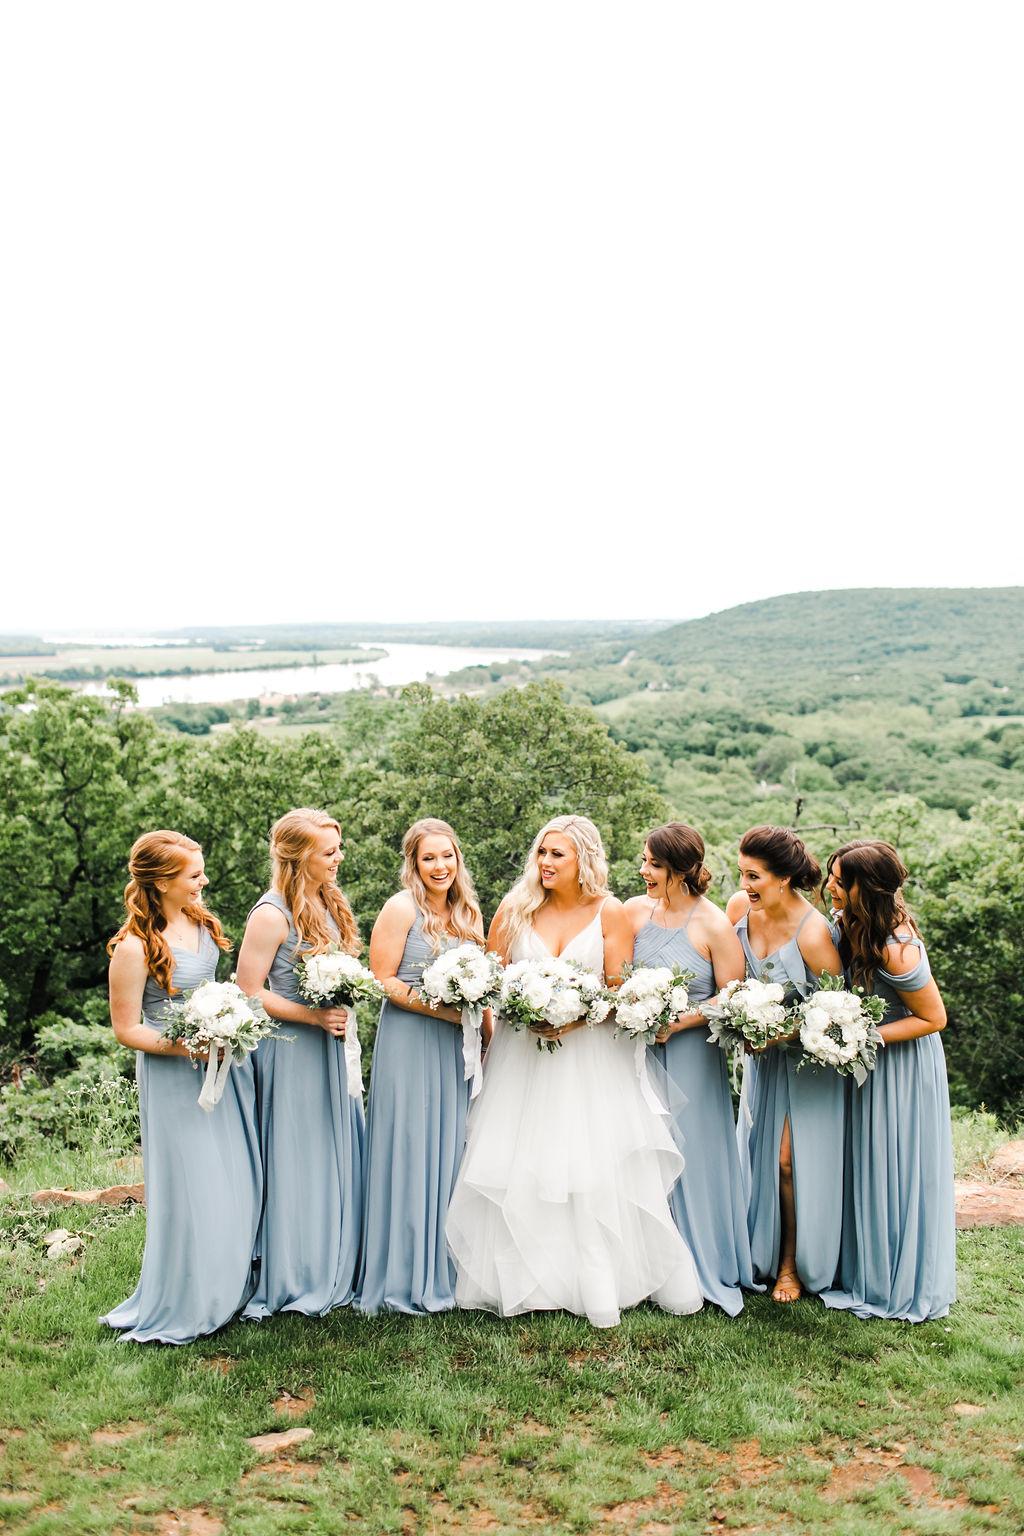 Dream Point Ranch Tulsa's White Barn Wedding Venue 59.jpg